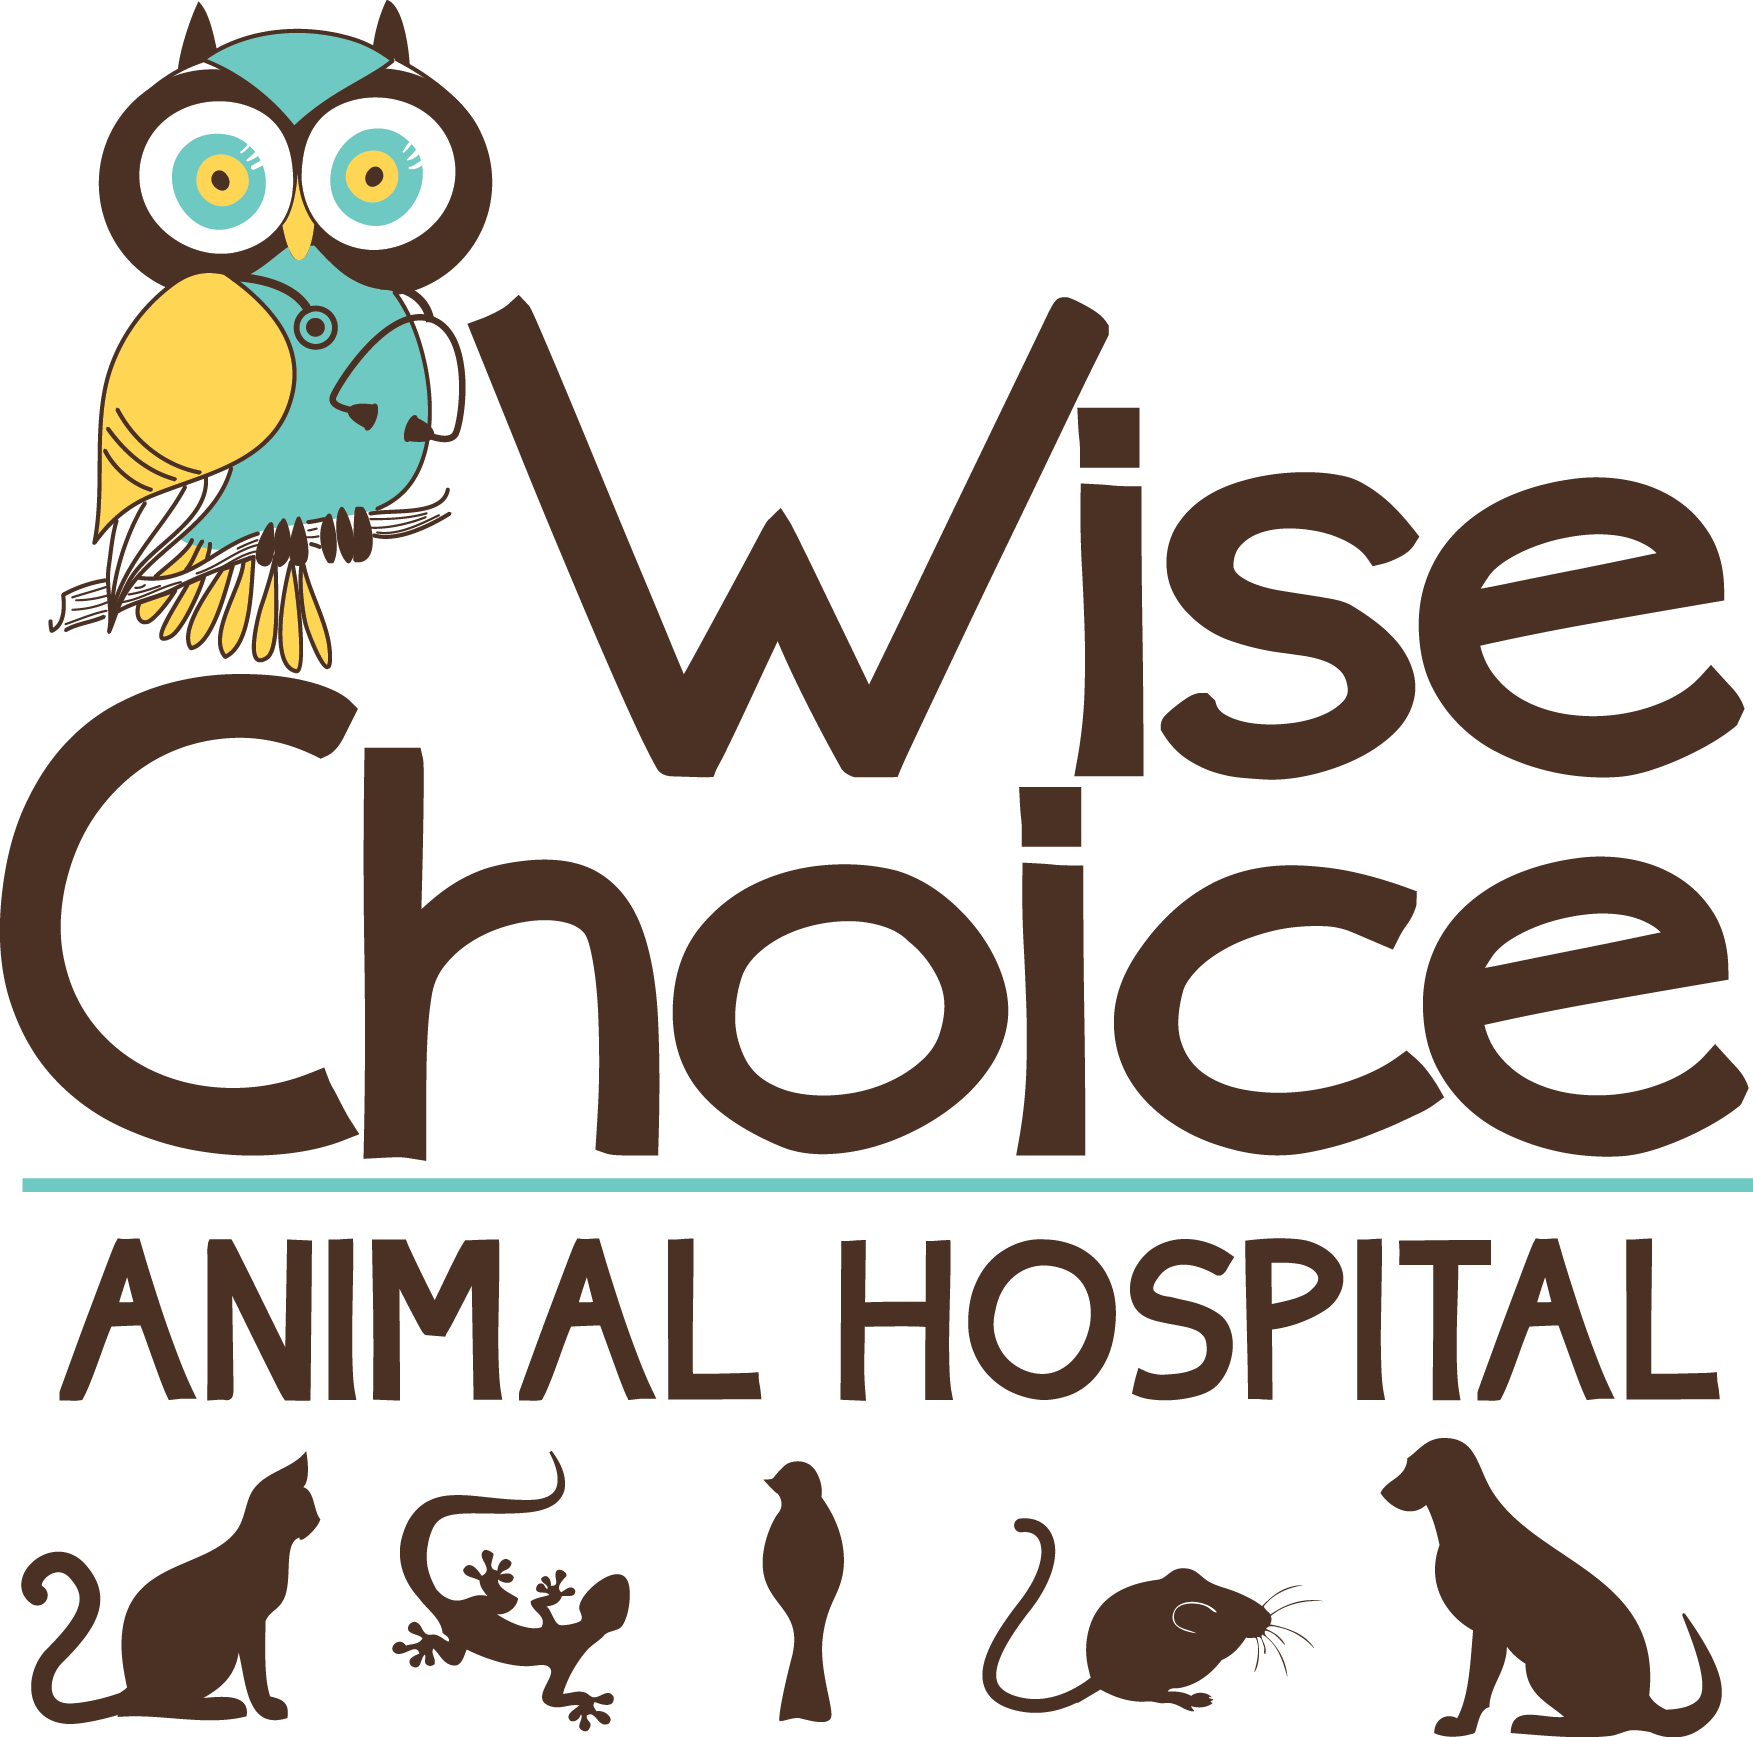 emergency clipart veterinary hospital